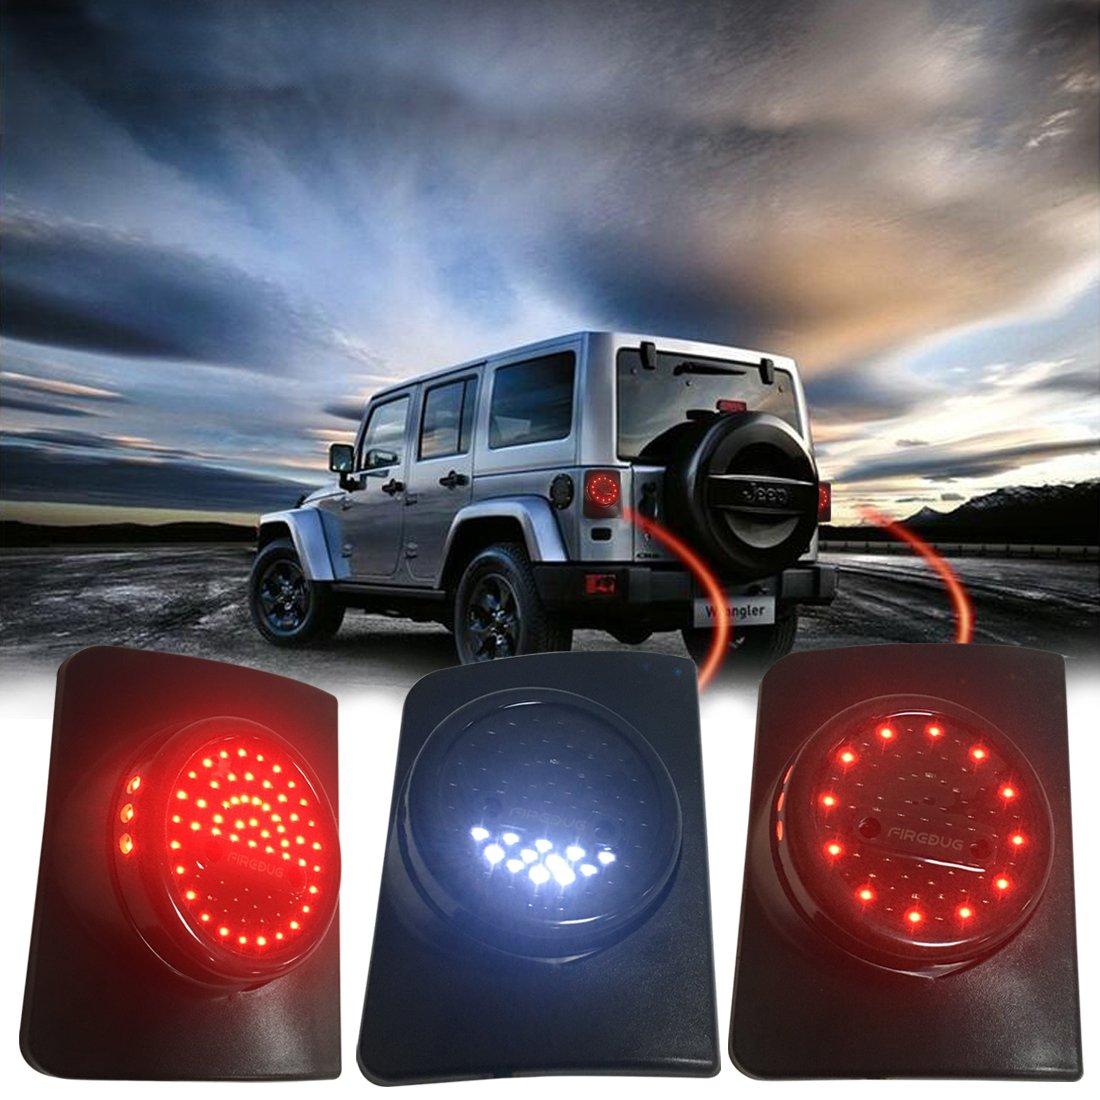 Amazon.com: Firebug Jeep Wrangler Rear LED Lights, Jeep Wrangler LED Tail  Lights, with LED Brake Lights Turn Signal Lights Back Up and Reverse Lights  for JK ...